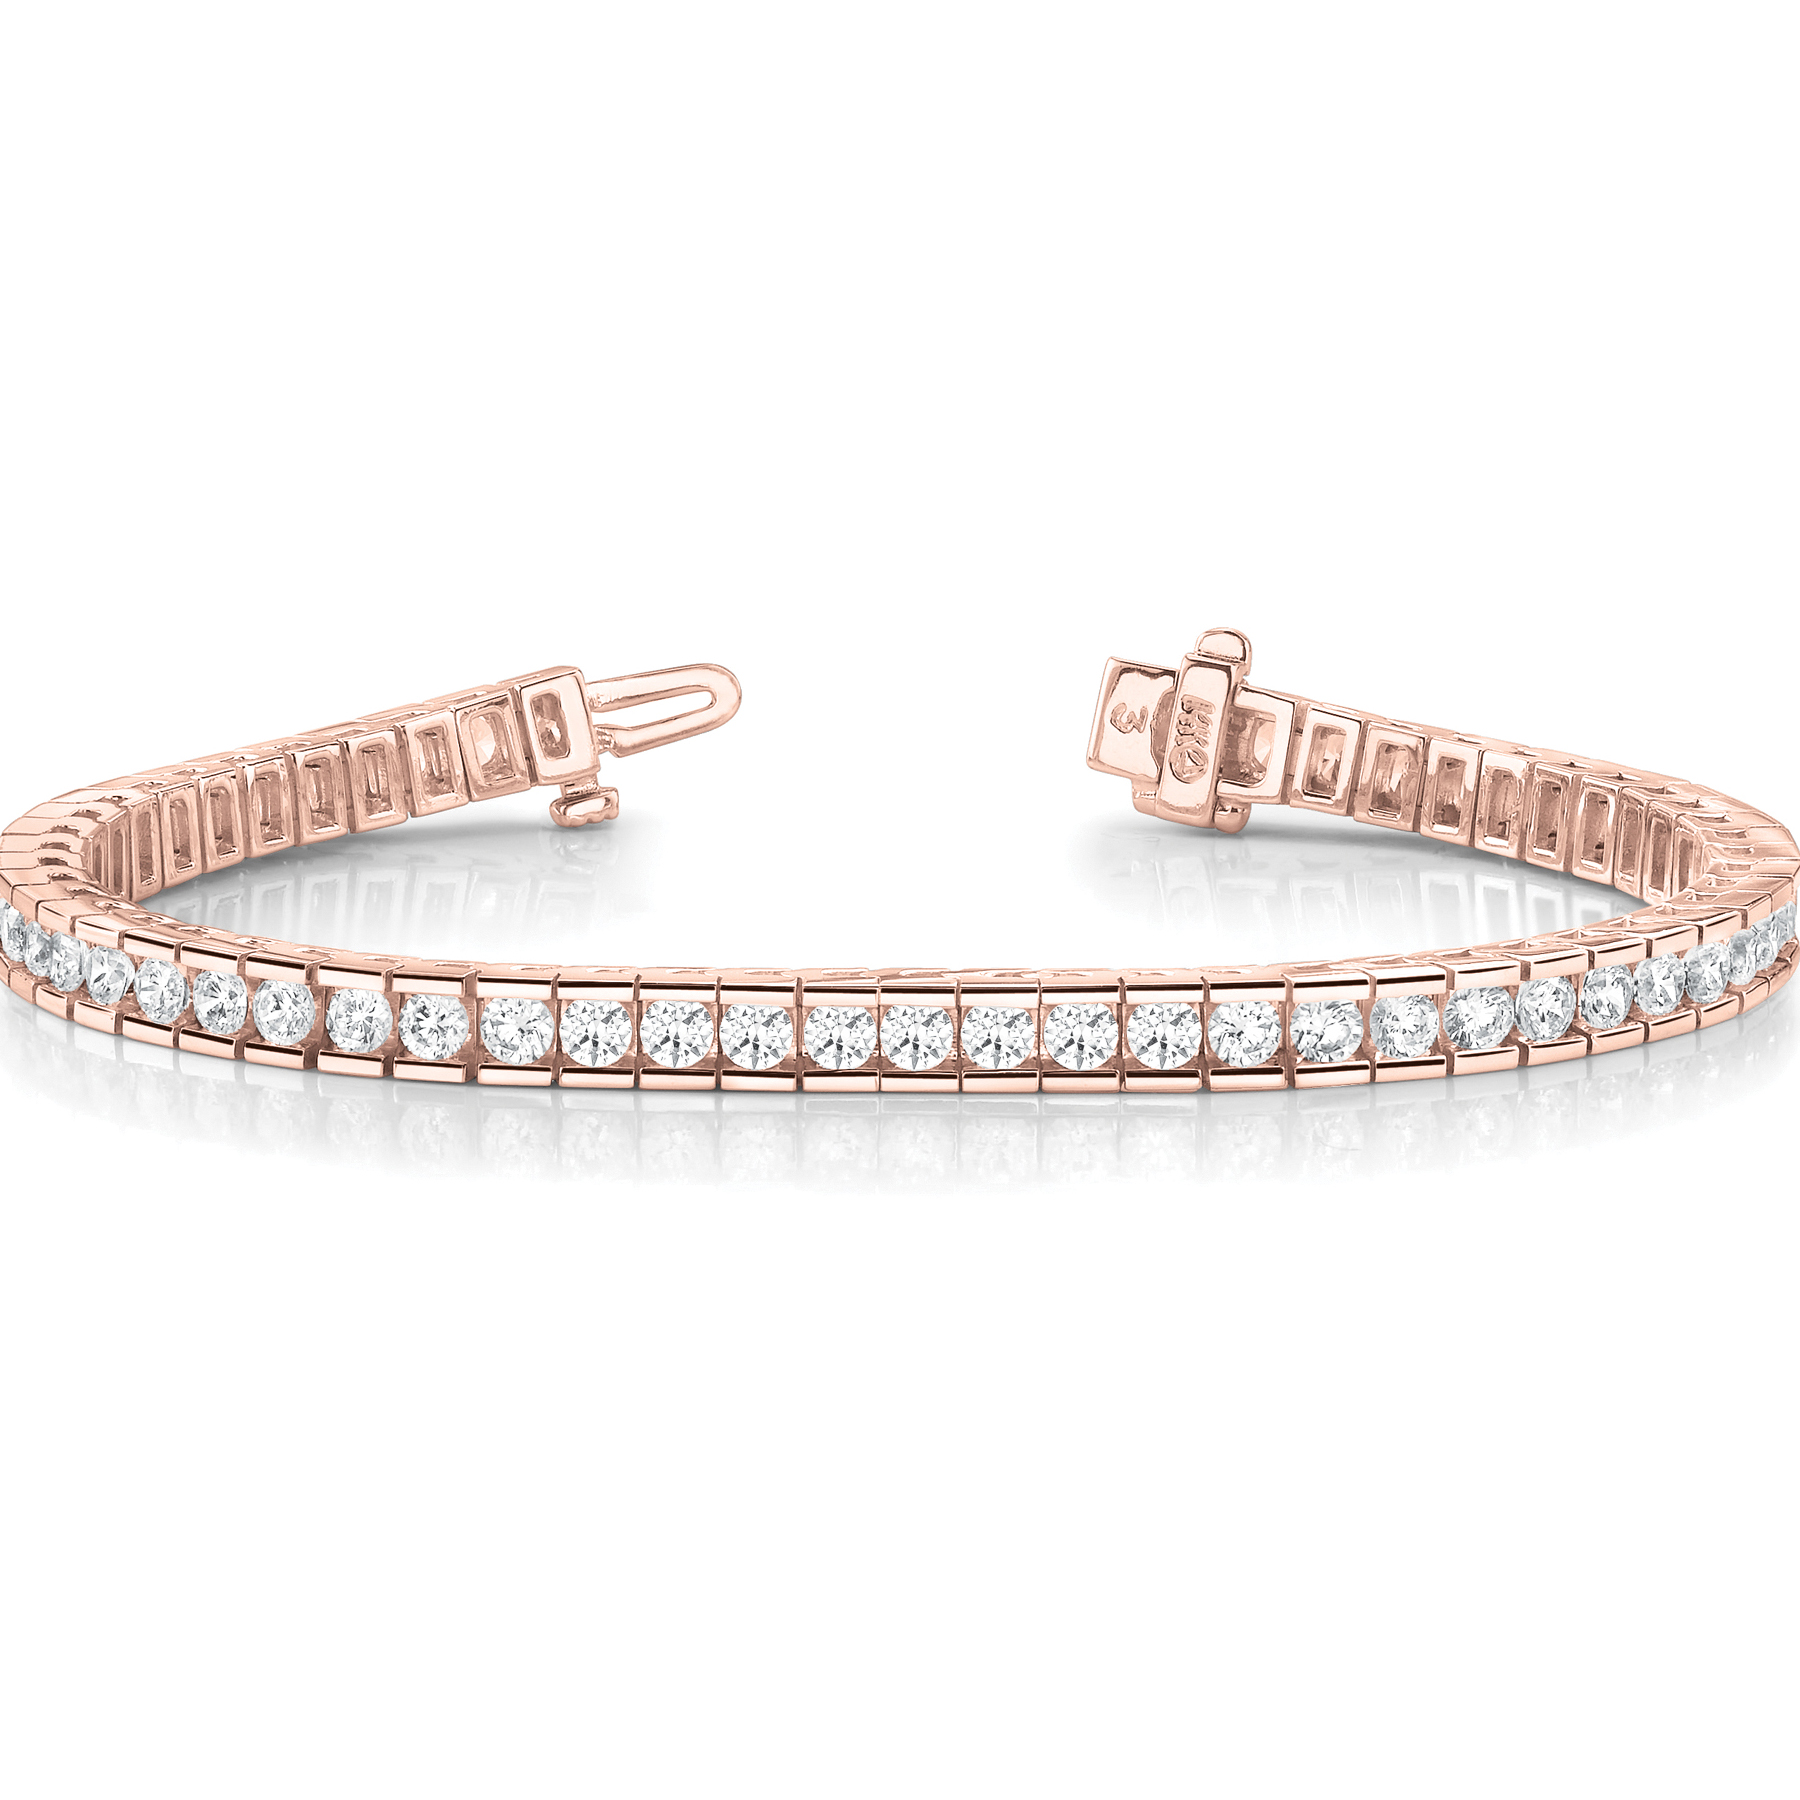 14k-rose-gold-channel-set-tennis-diamond-bracelet-4489-10-05